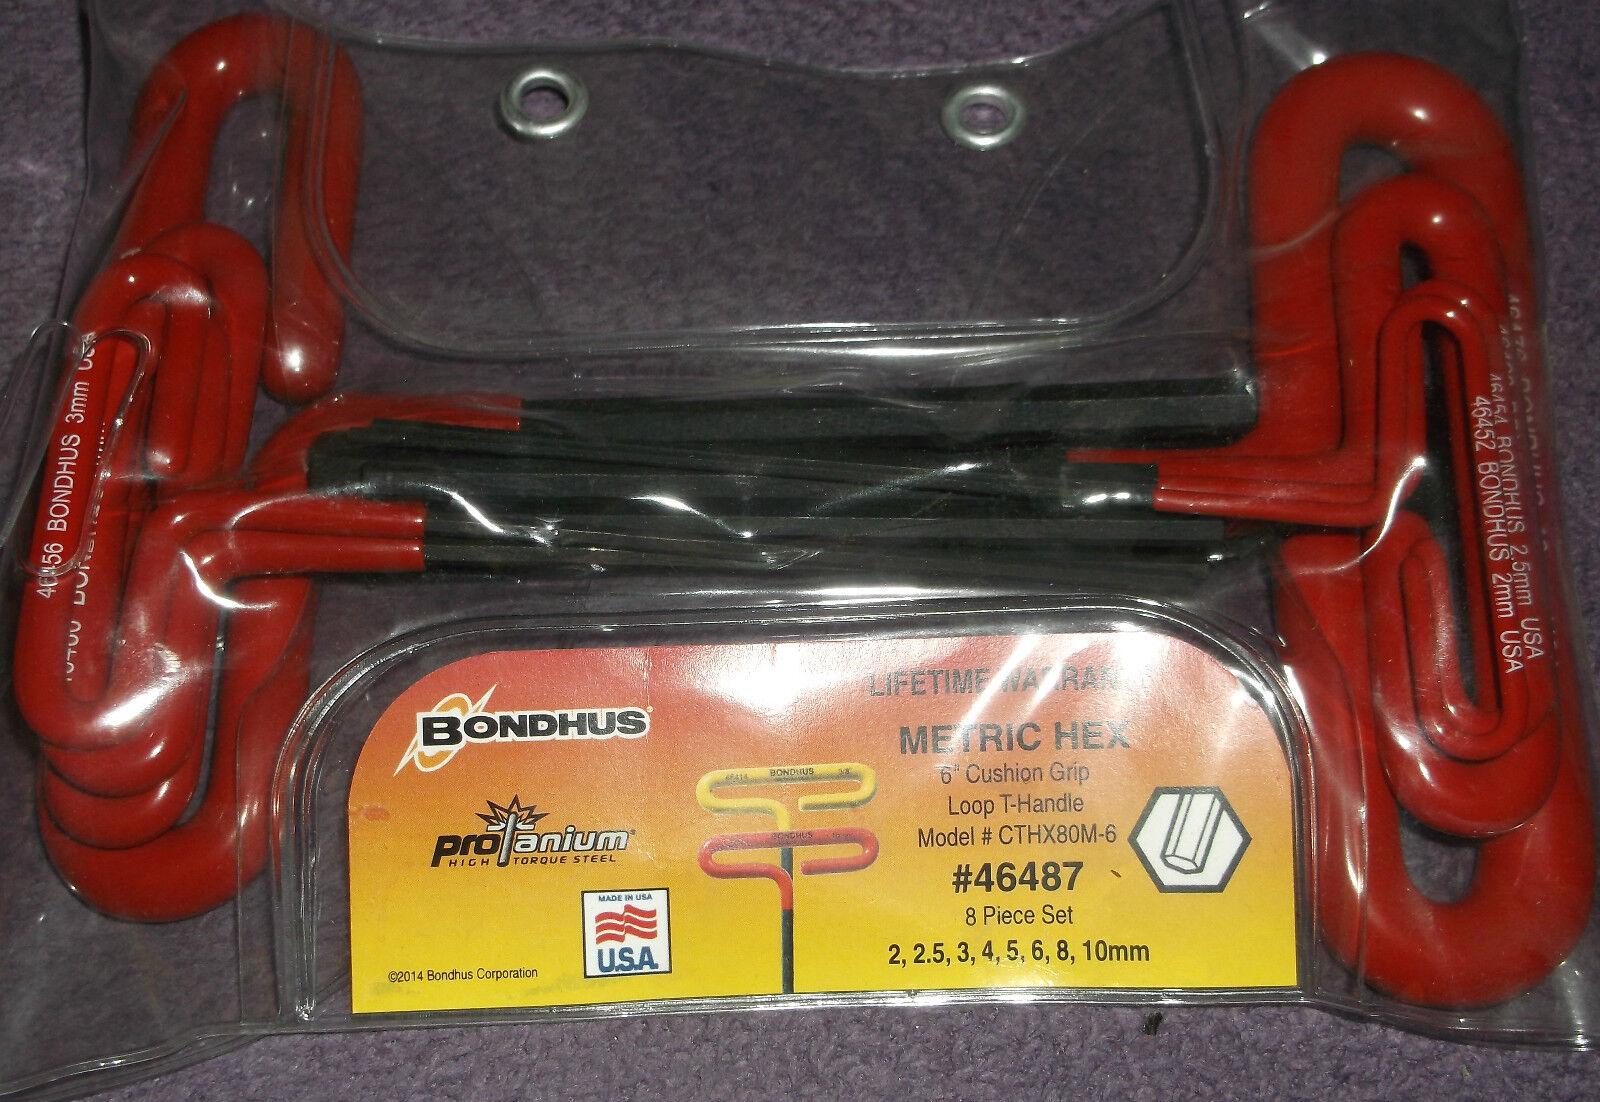 46487 Bondhus 6  Loop T Handle Cushion Grip 8 Piece Hex Key Allen Set